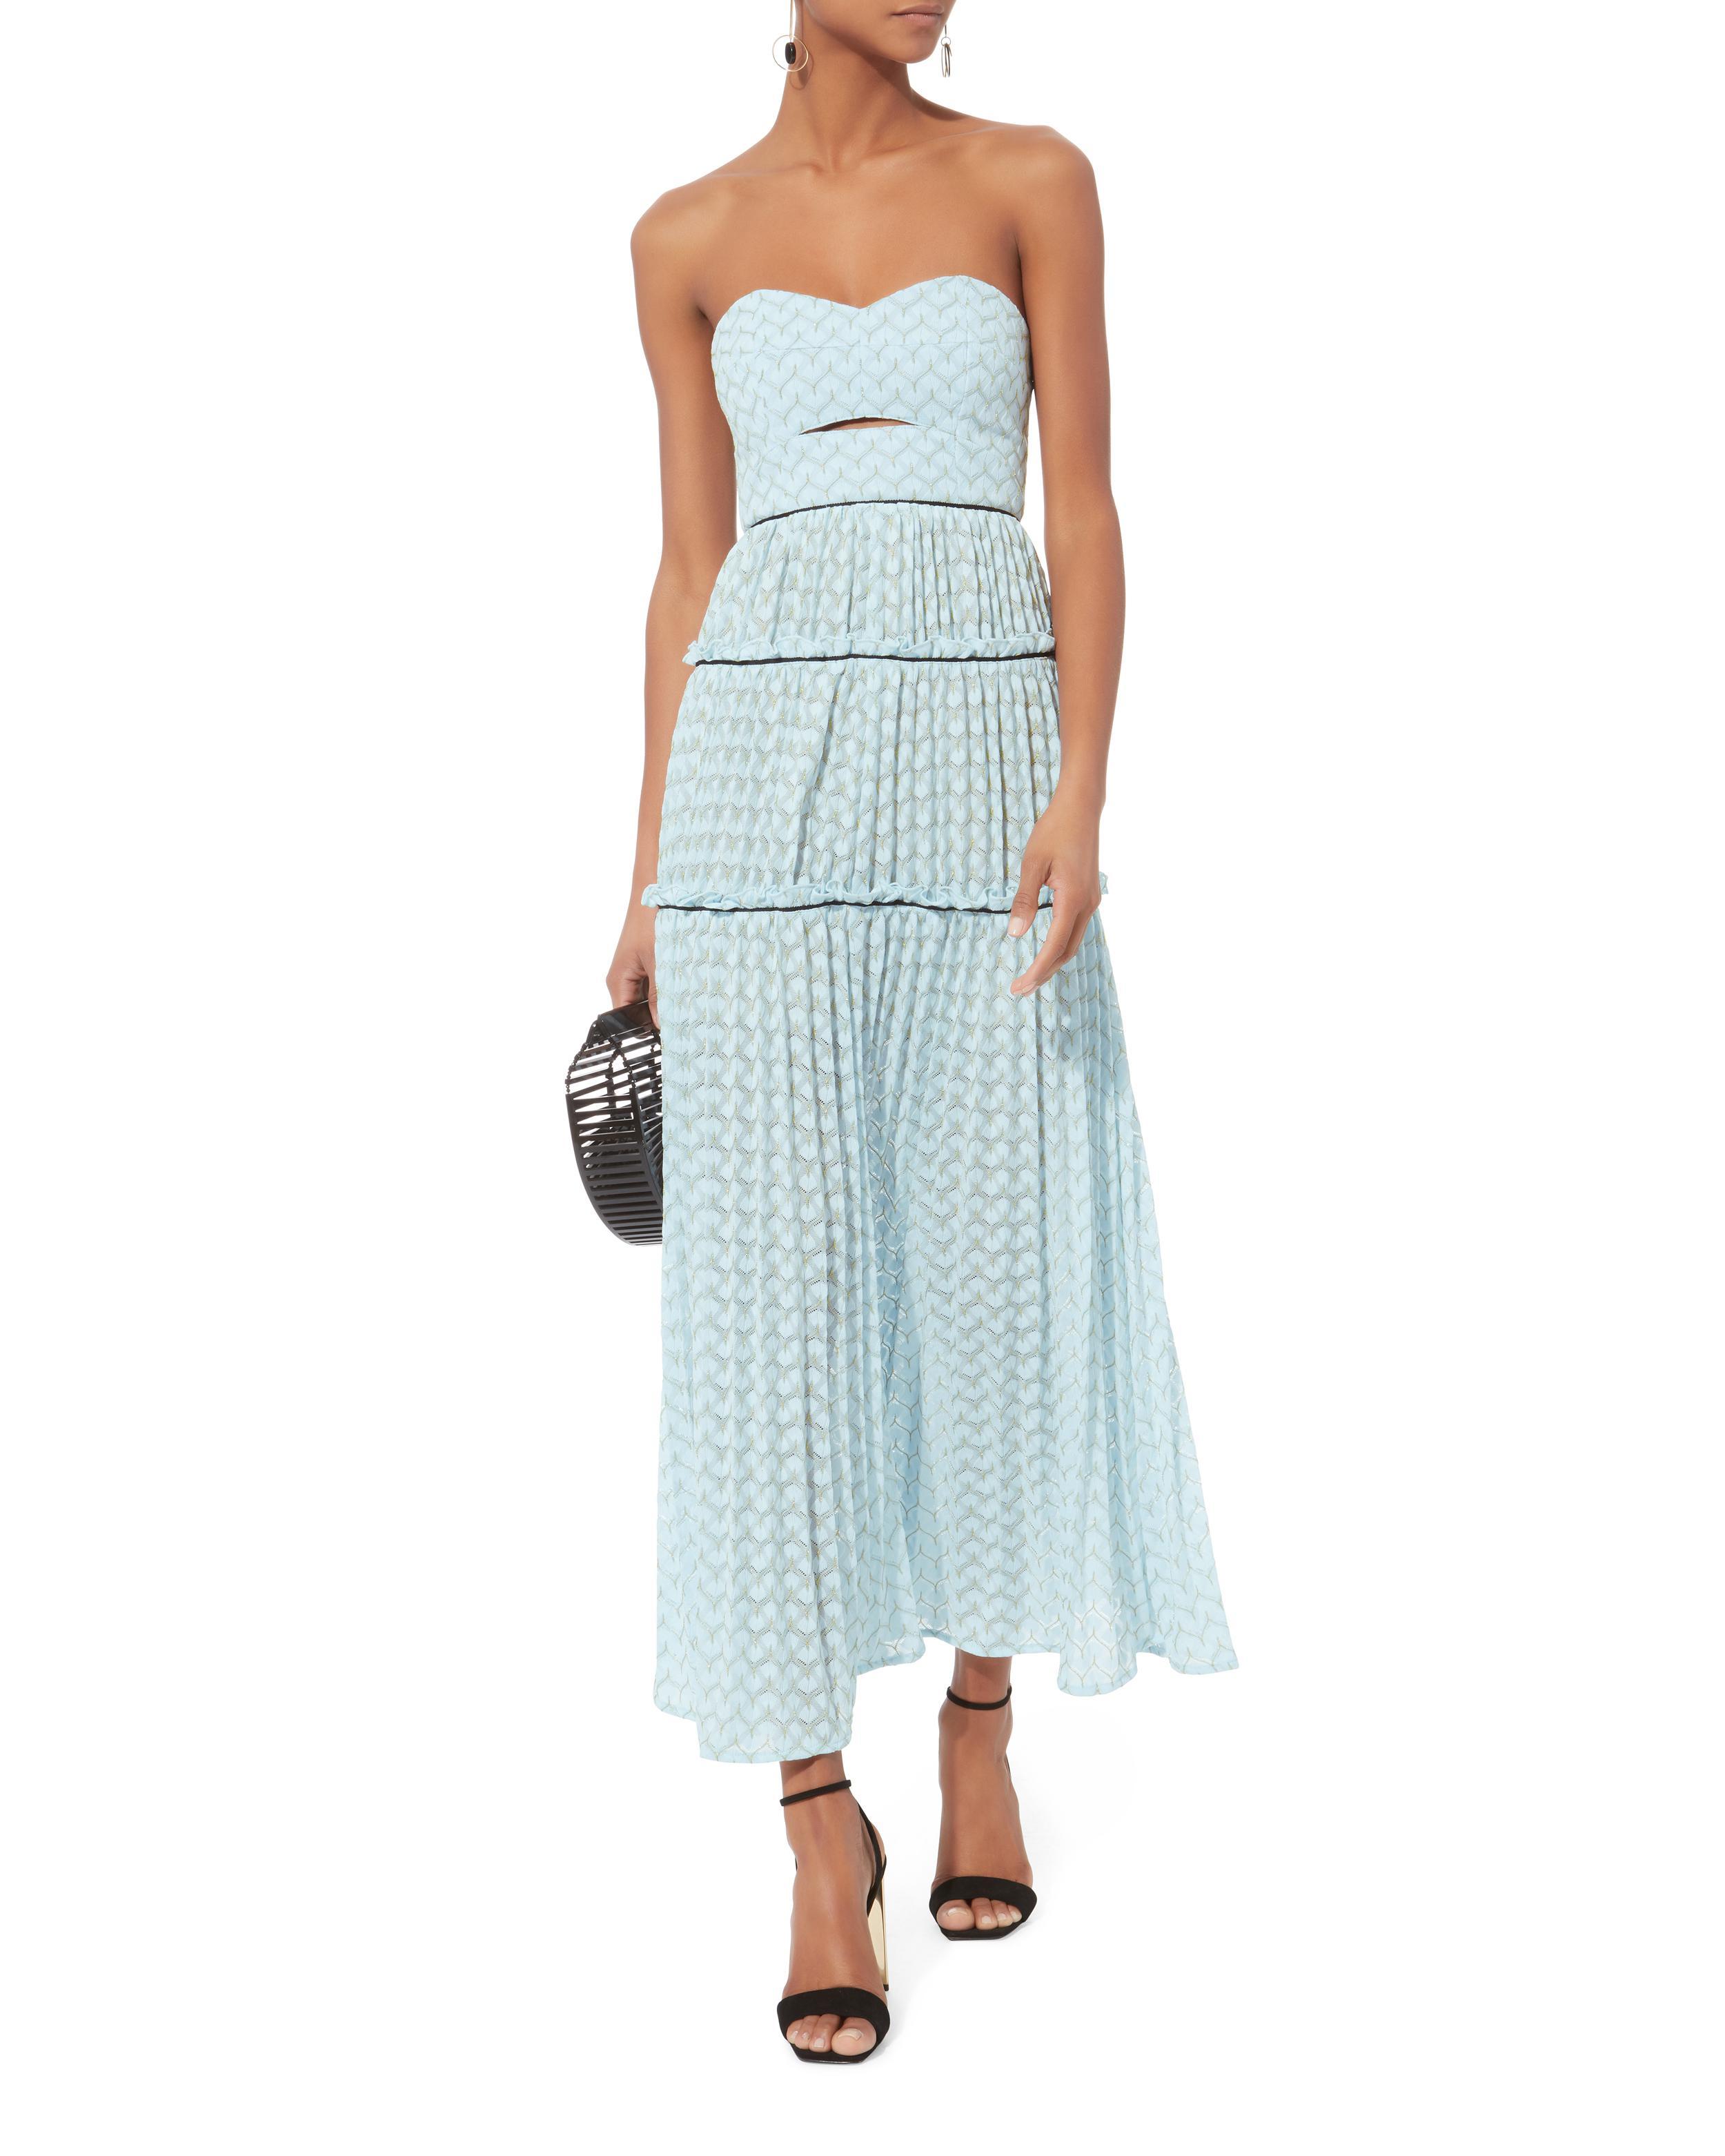 Lyst - Self-Portrait Bandeau Chevron Knit Maxi Dress in Blue